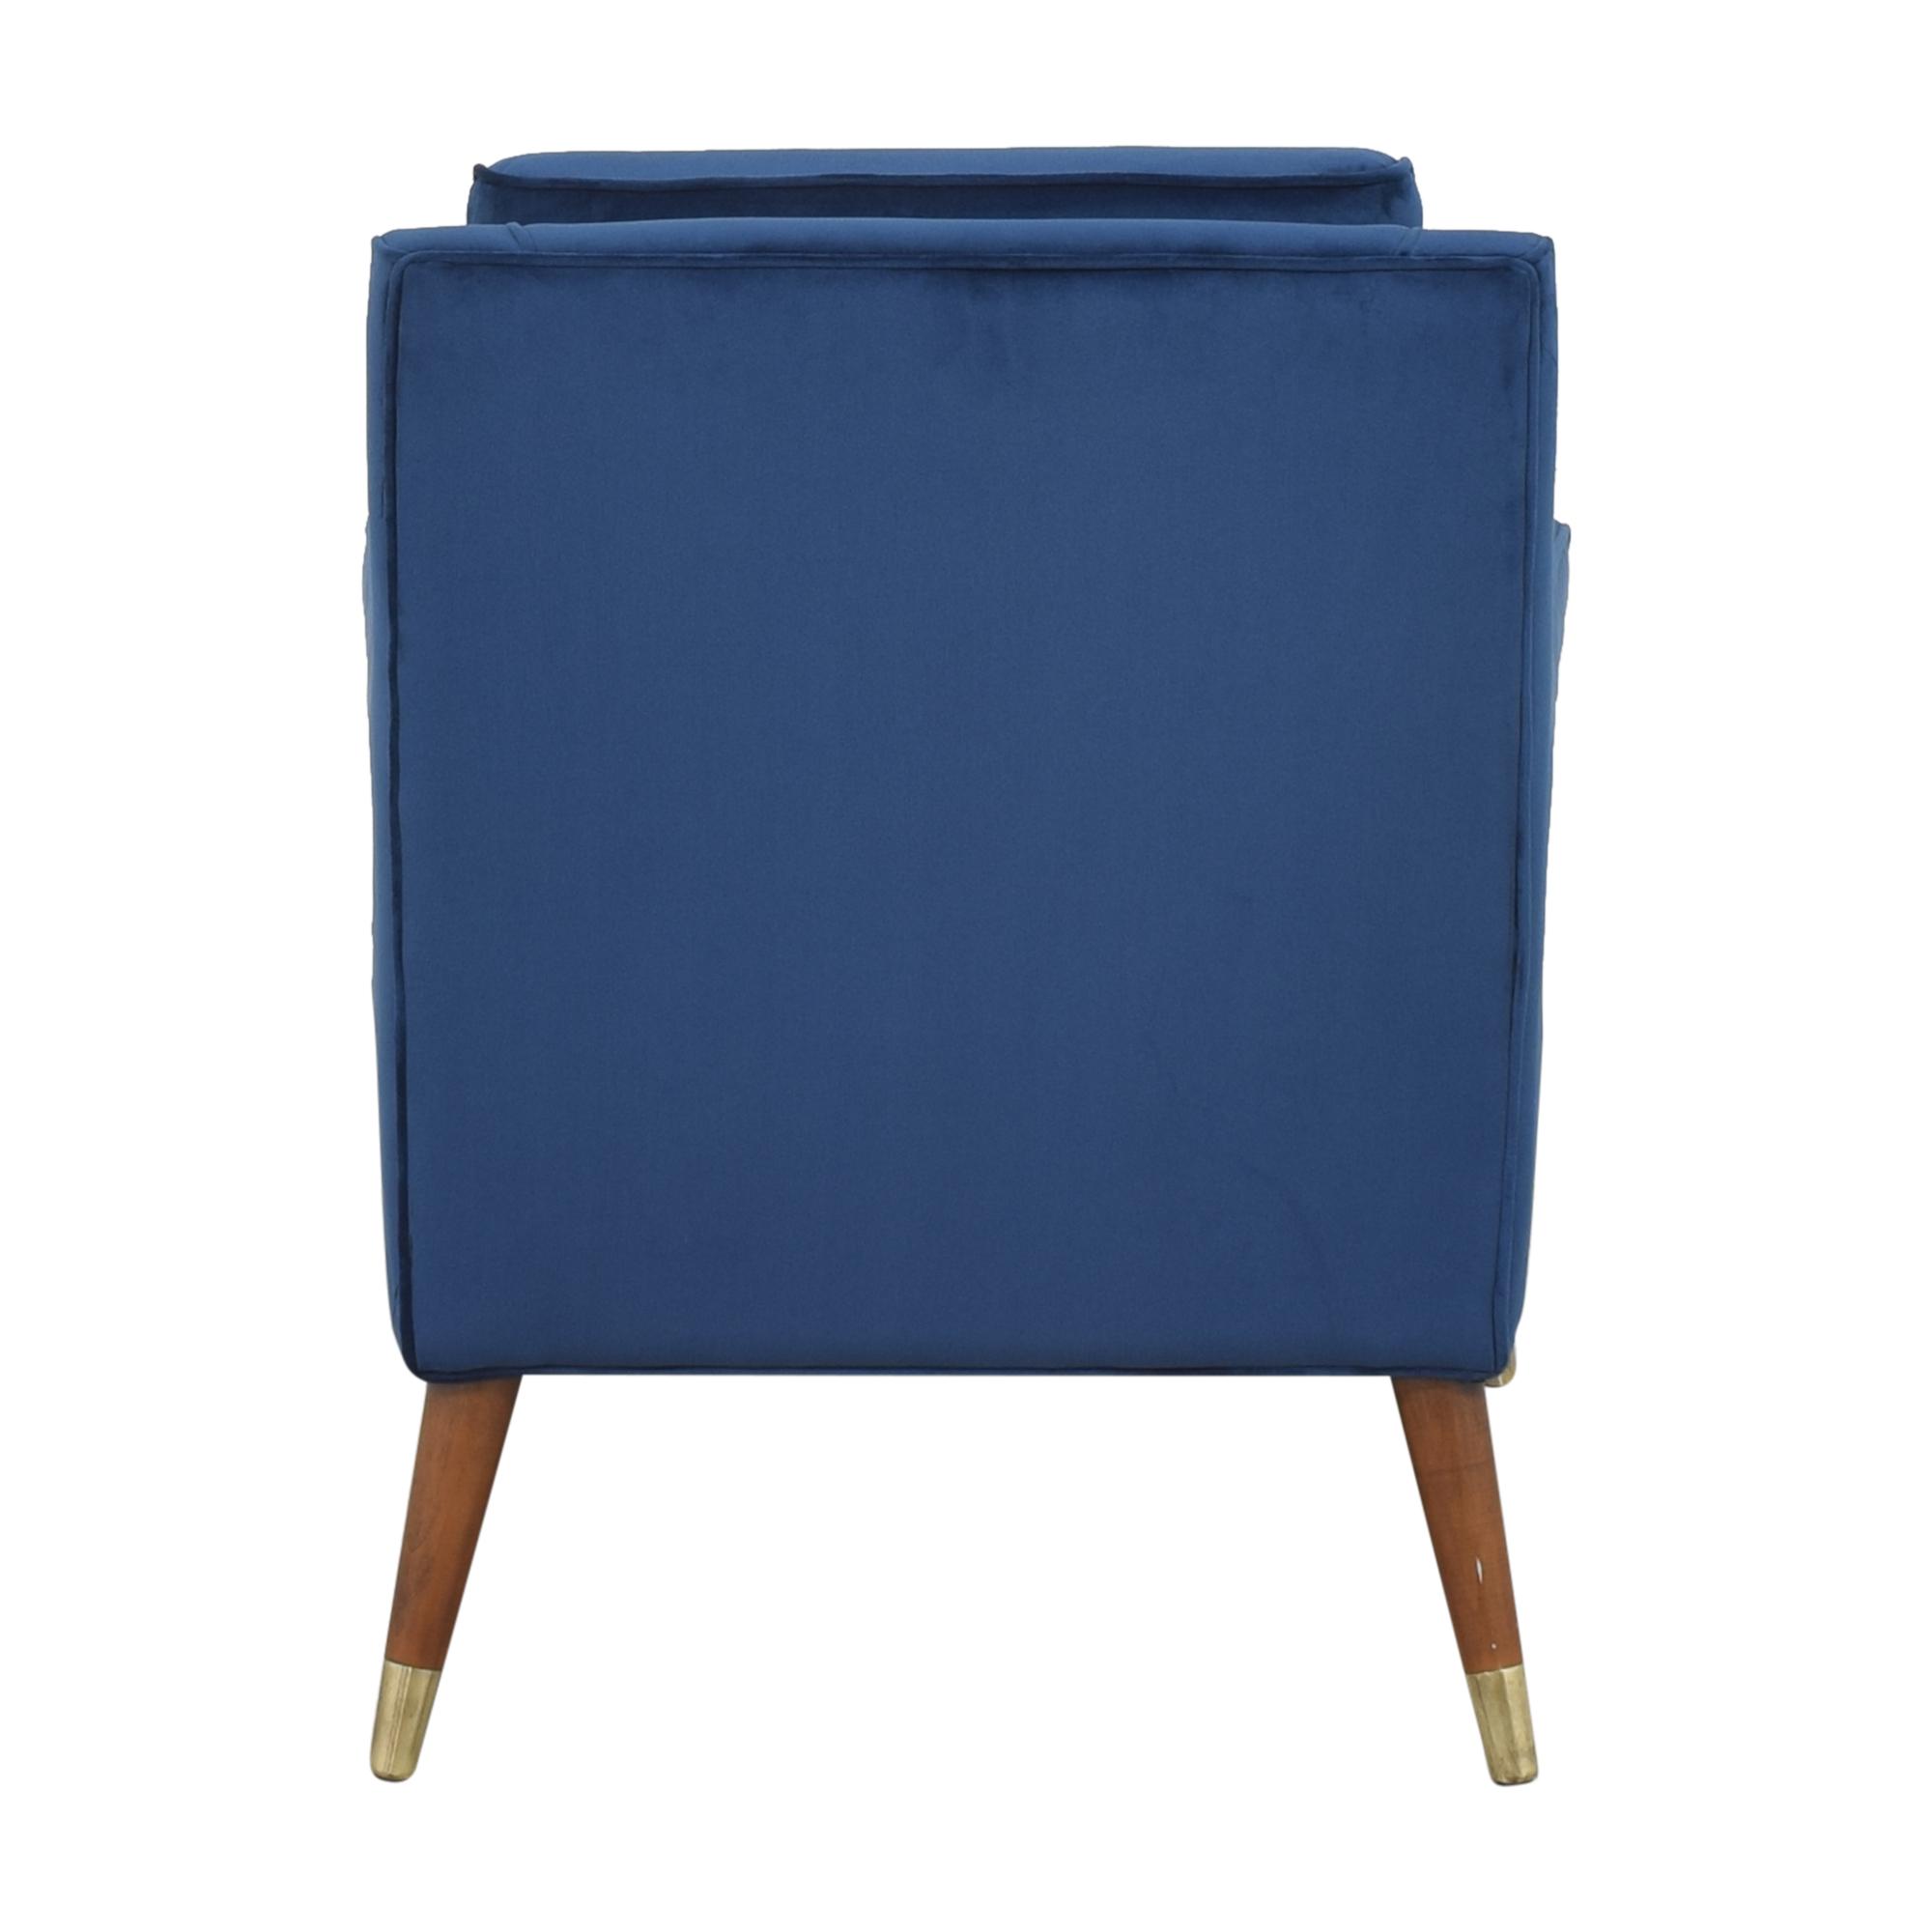 Tov Tov Draper Chair on sale